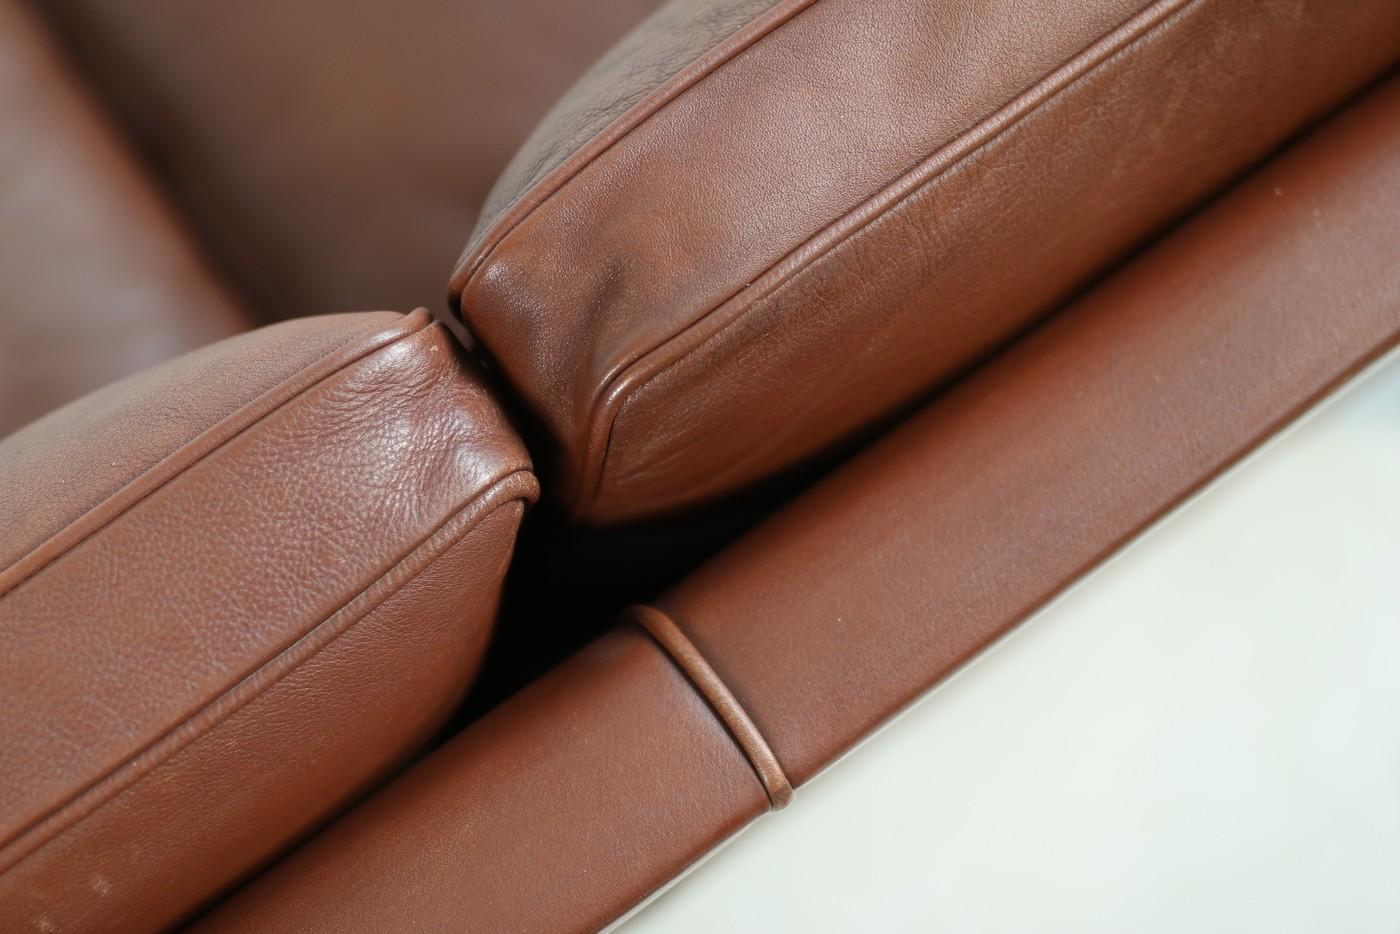 borge mogensen sofa model 2209 slipcovers walmart 1960s leather mod by fredericia dk